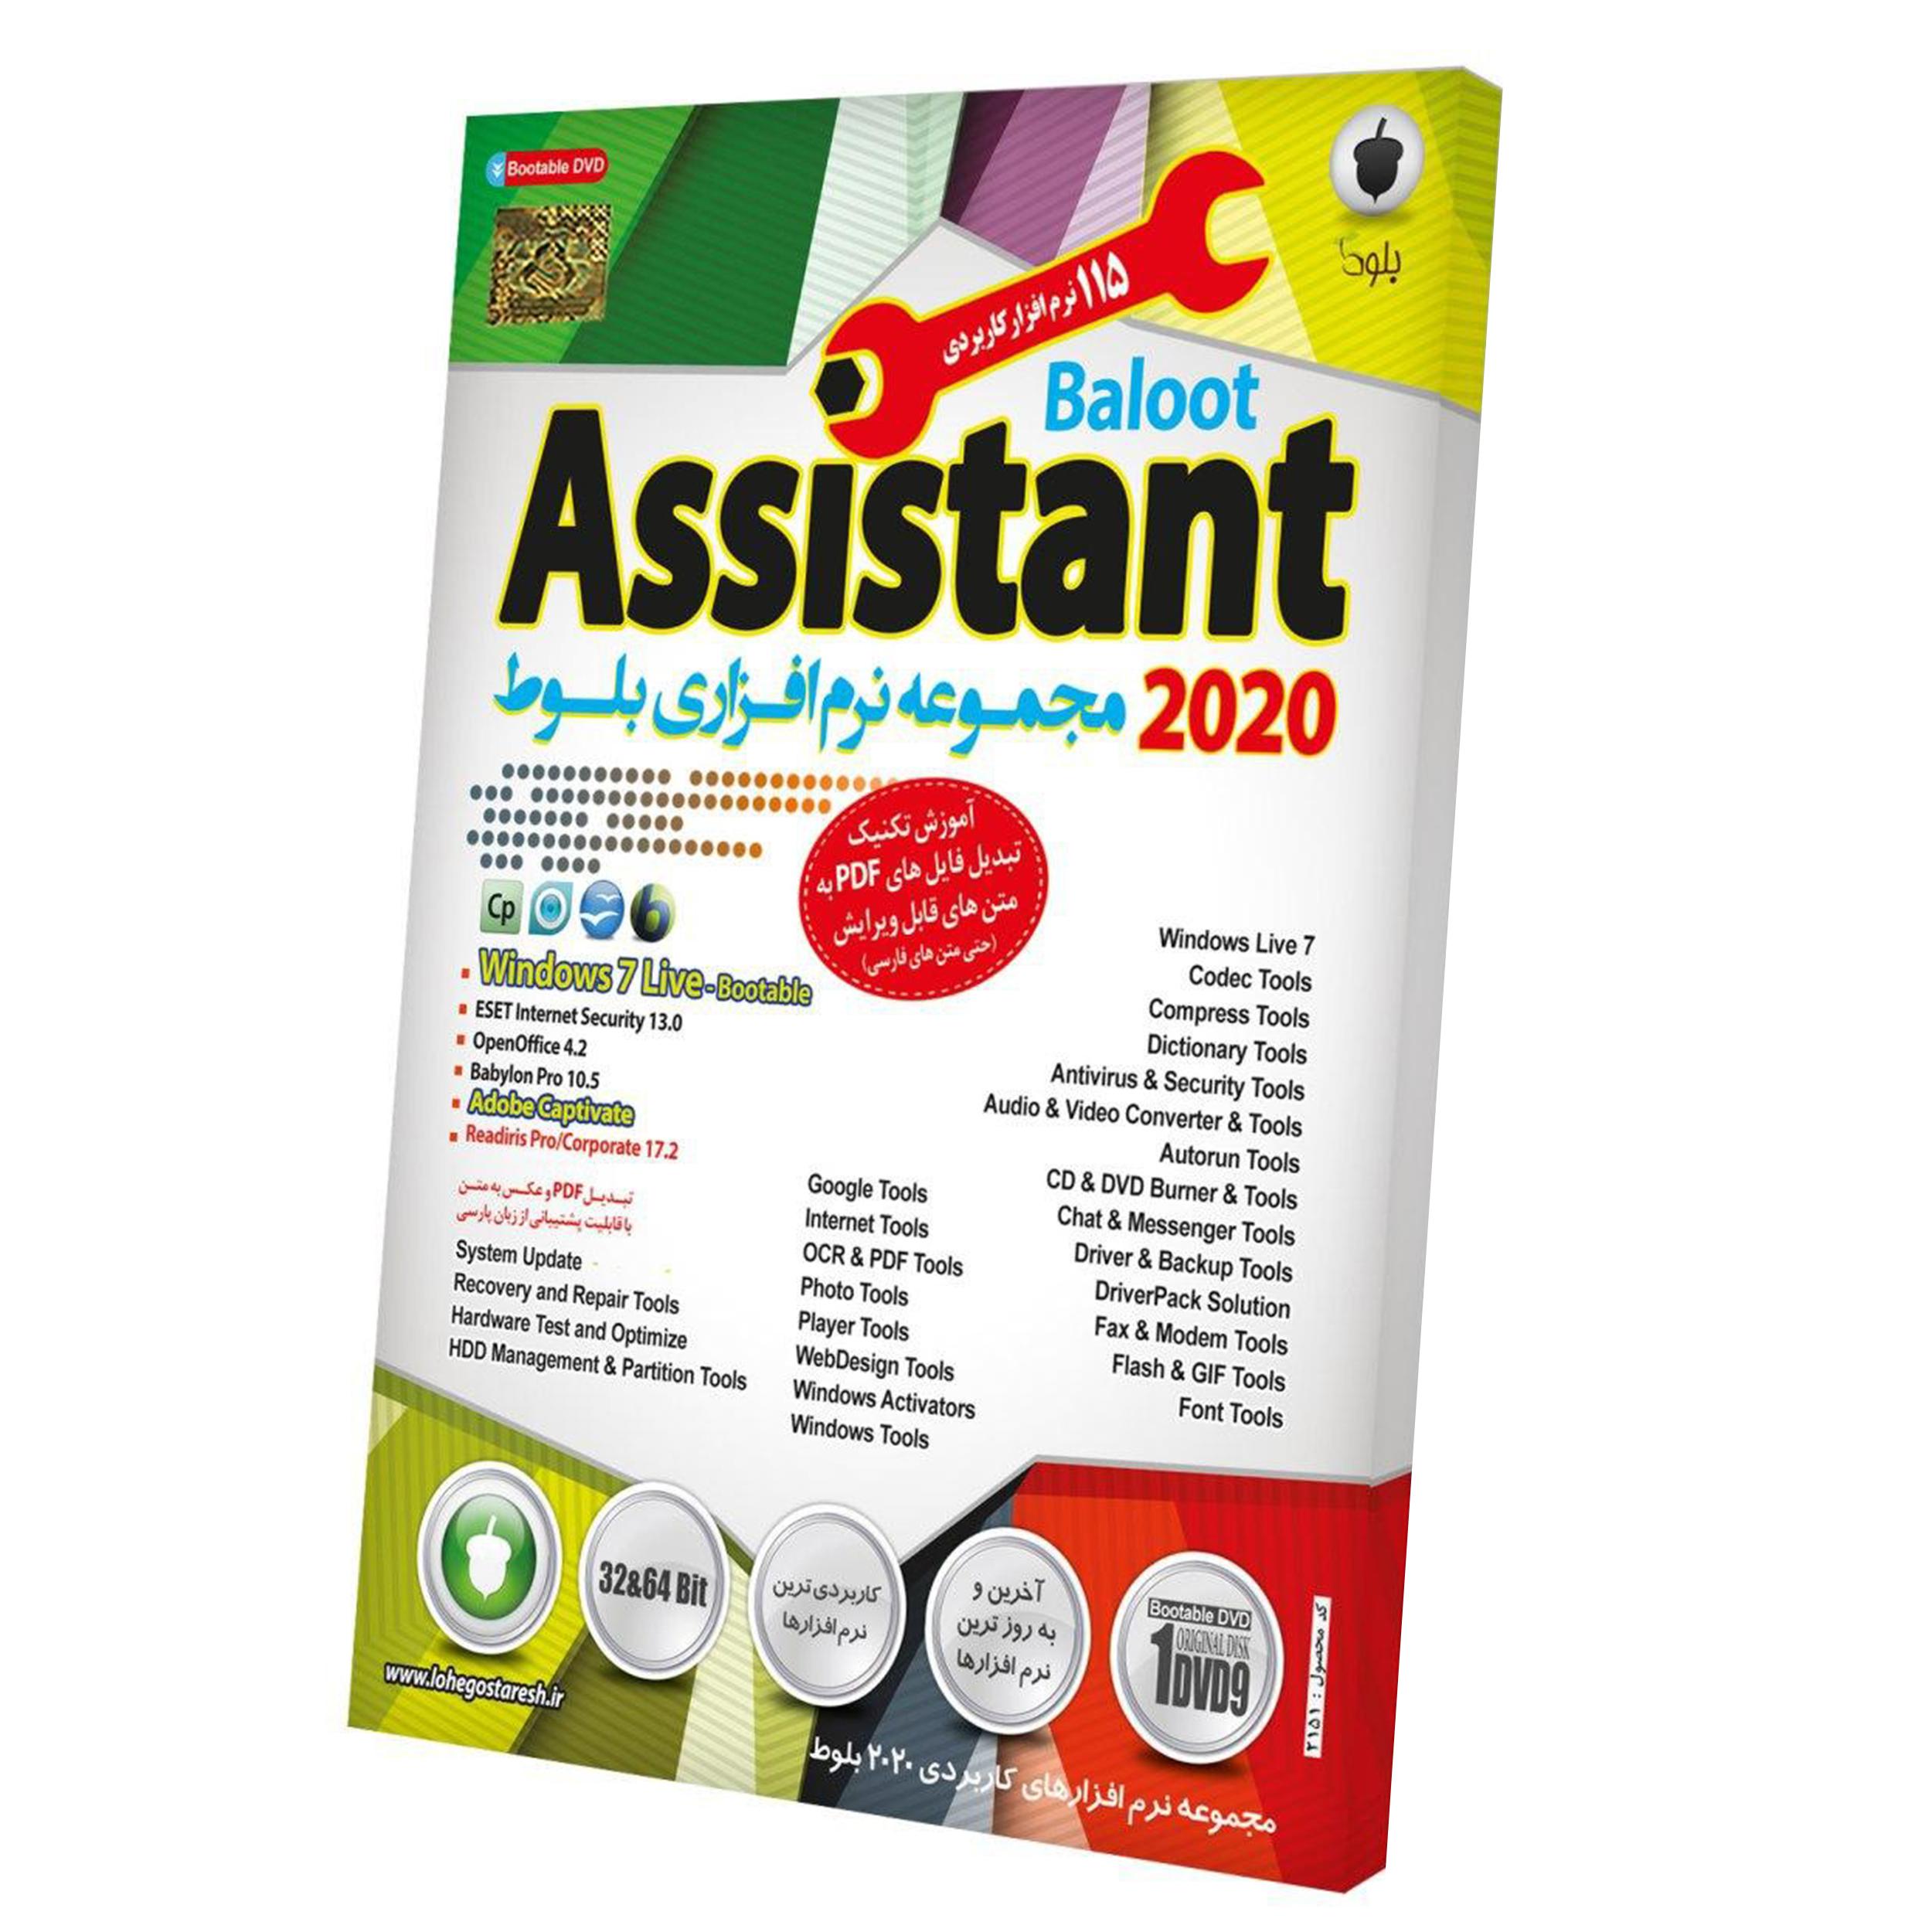 نرم افزار Assistant انتشارات بلوط